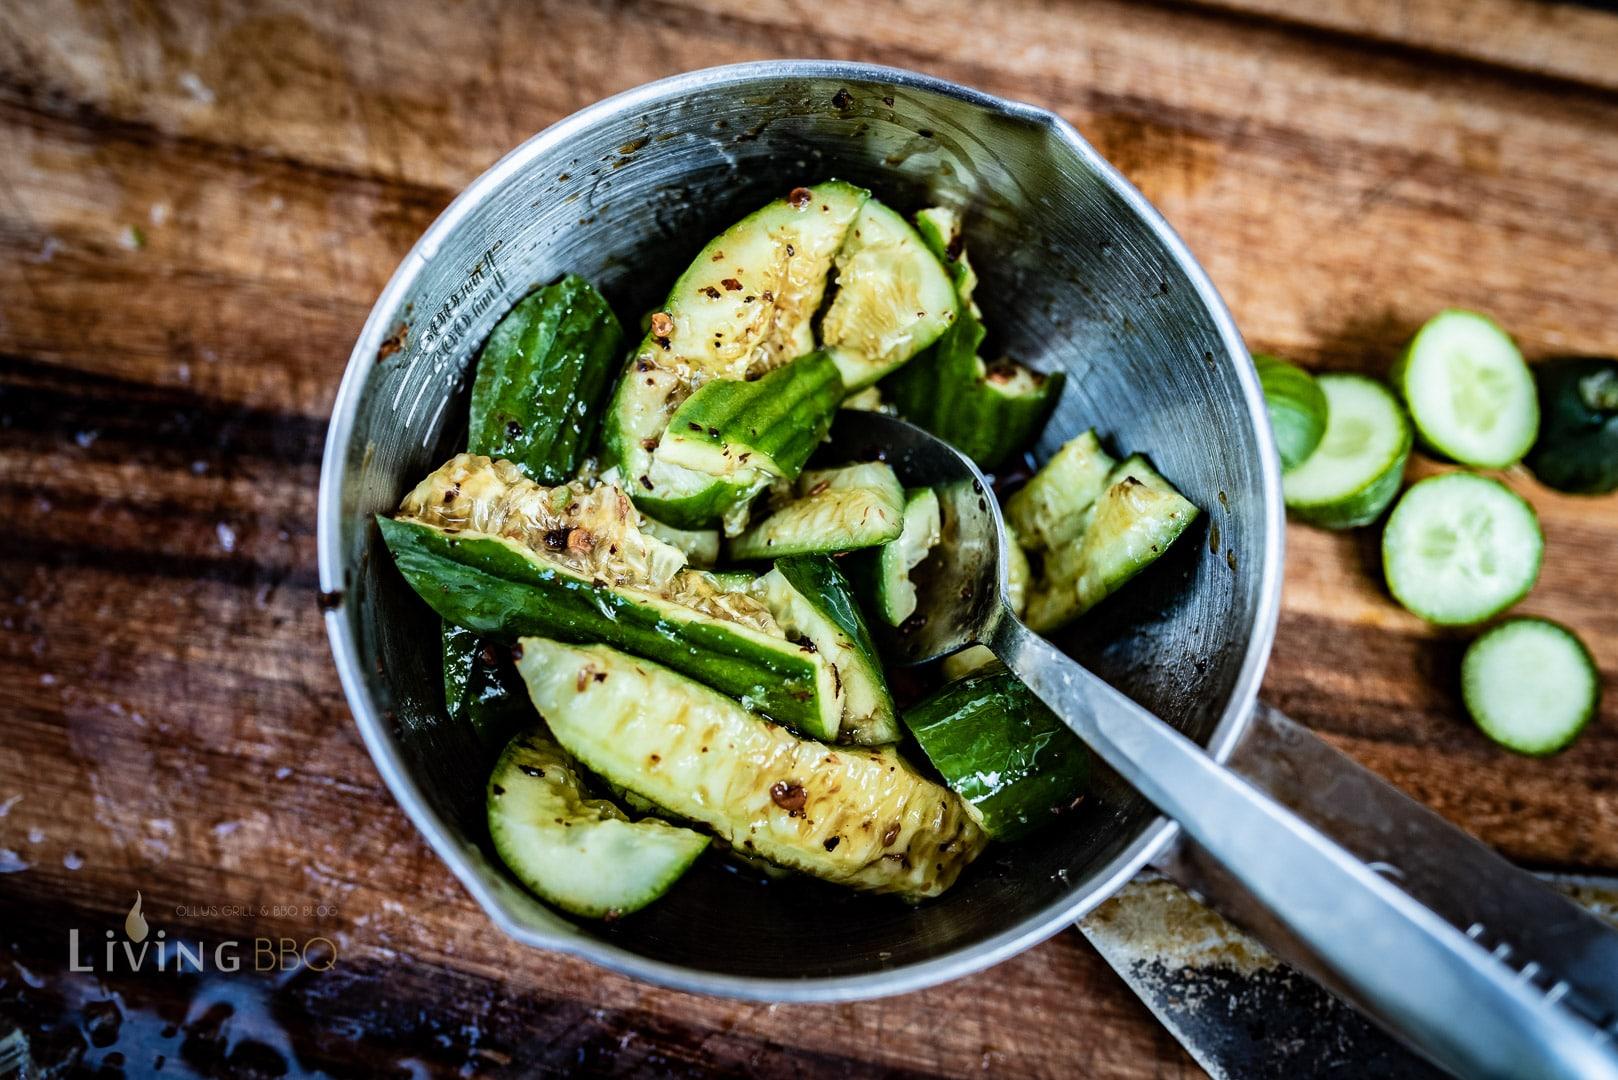 Mini Salatgurken würzen